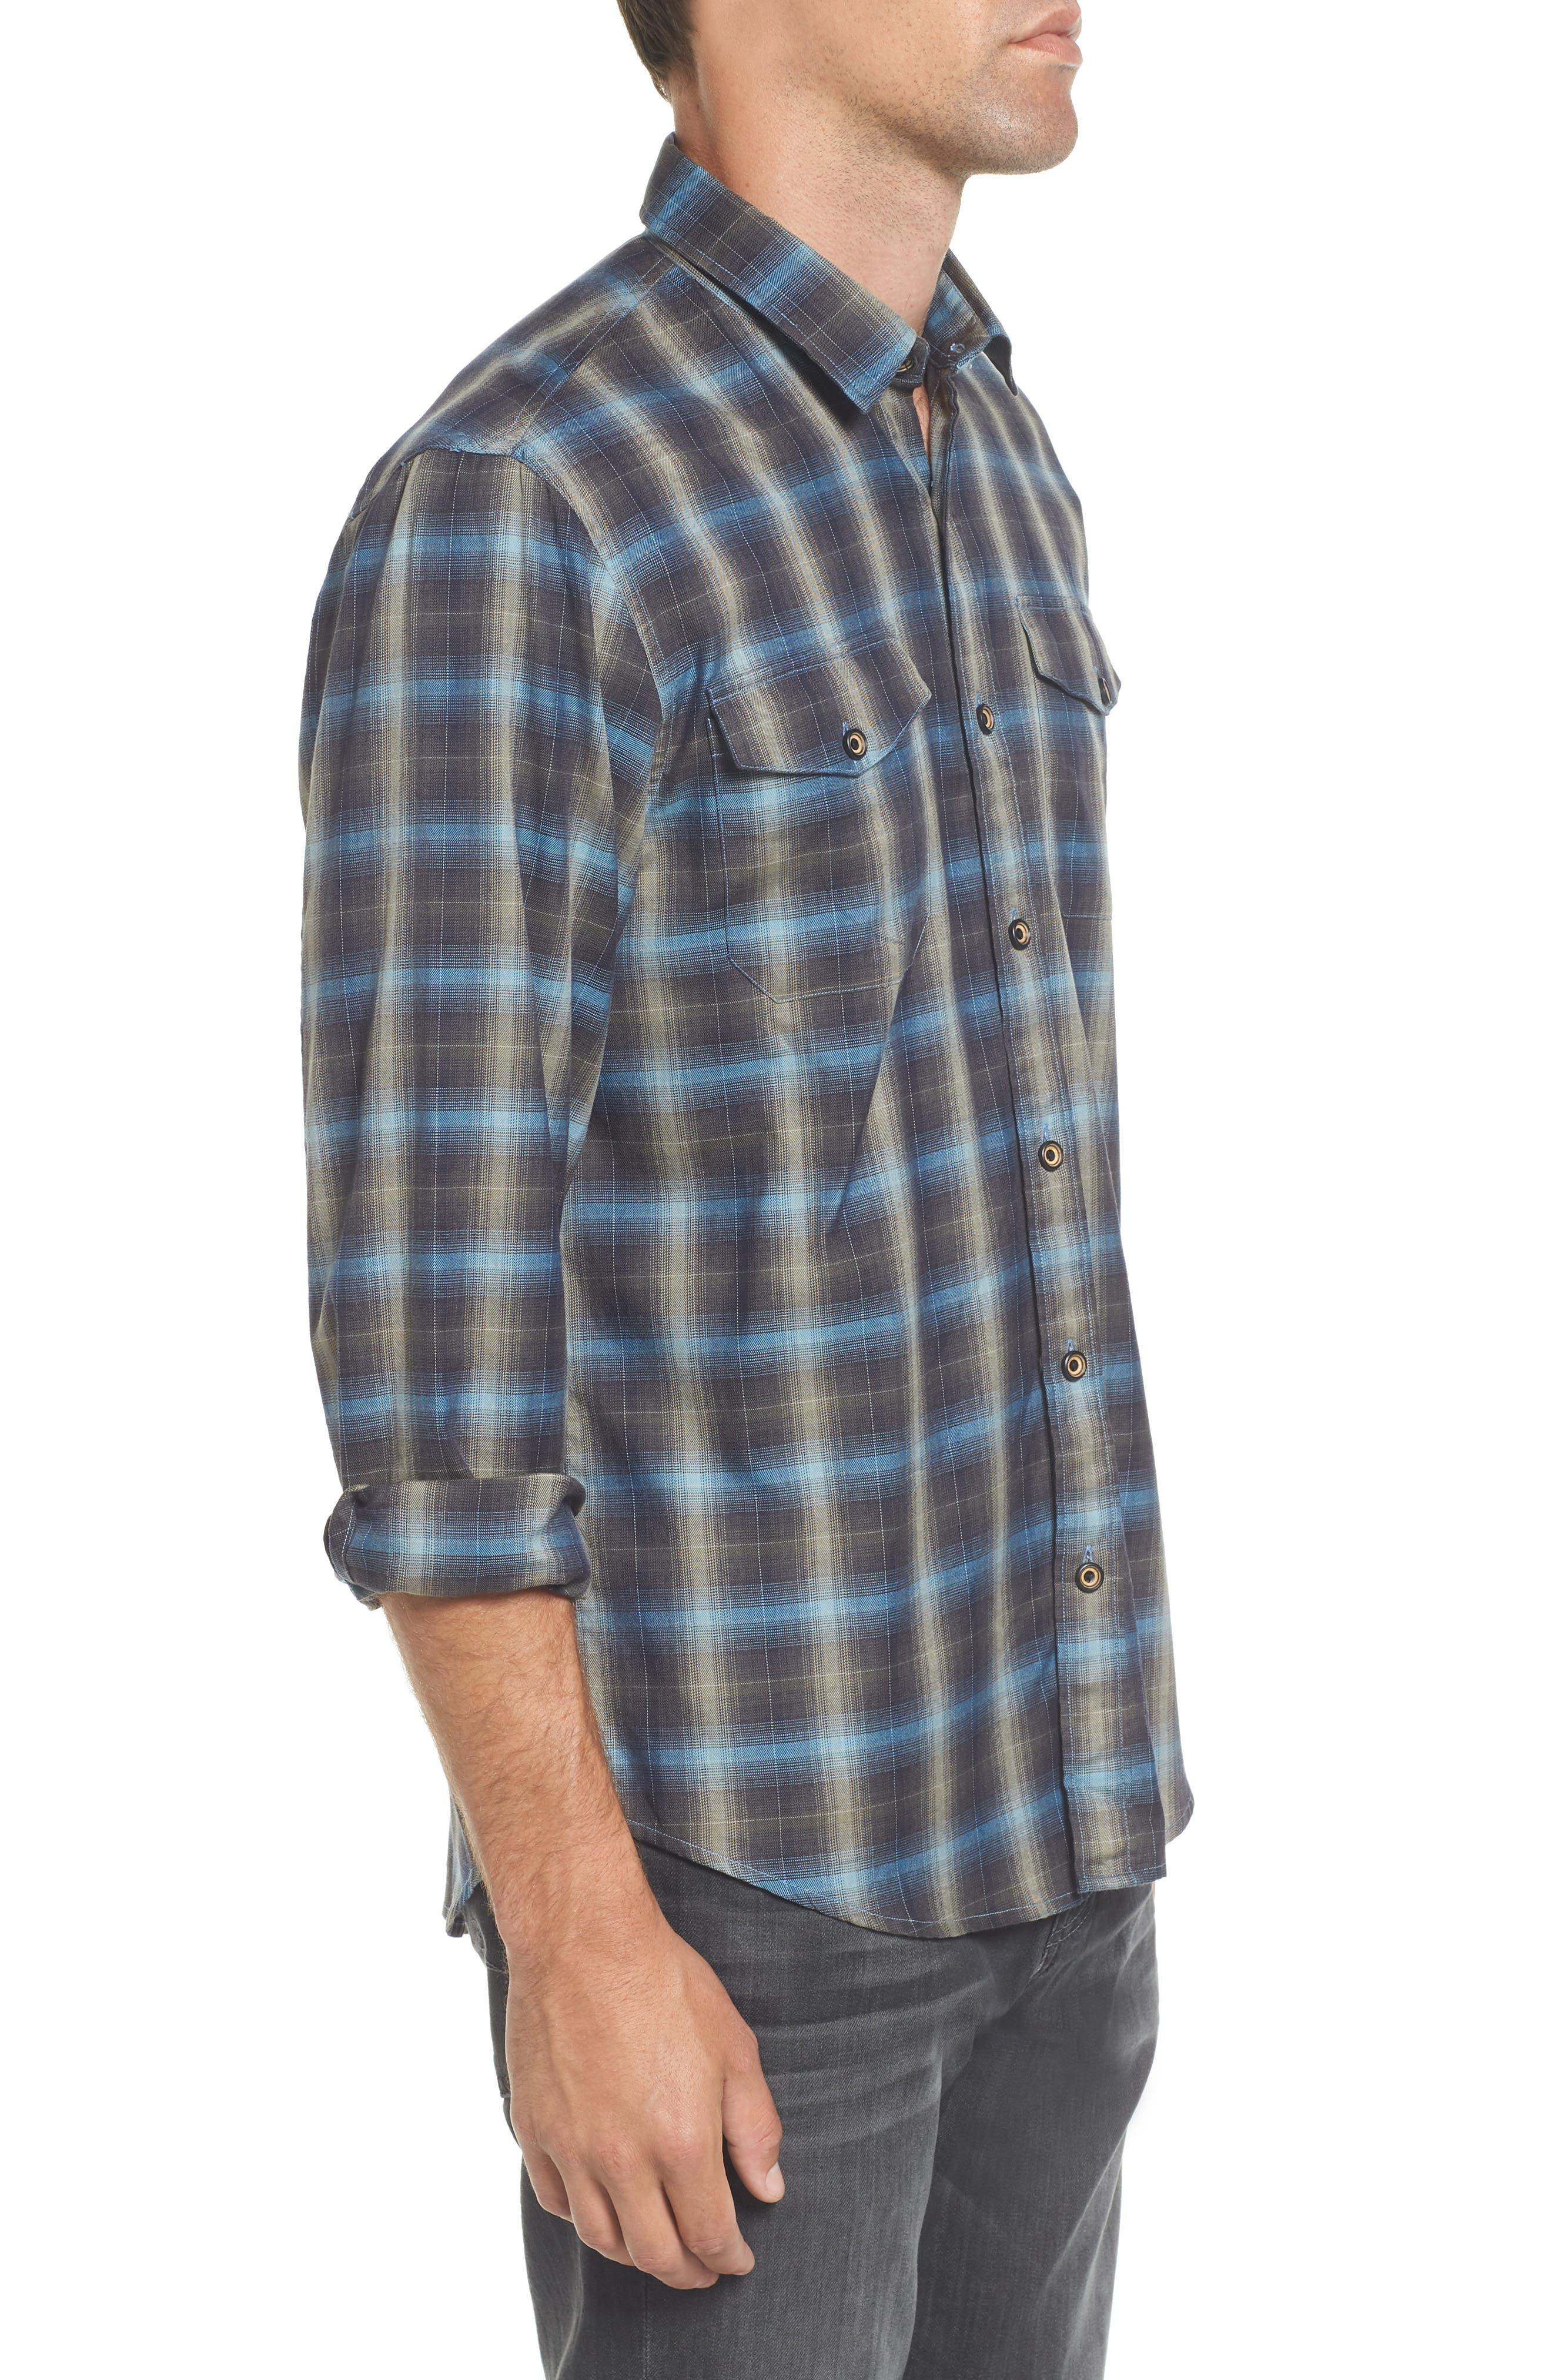 Alternate Image 3  - Coastaoro Walnut Plaid Garment Washed Flannel Shirt